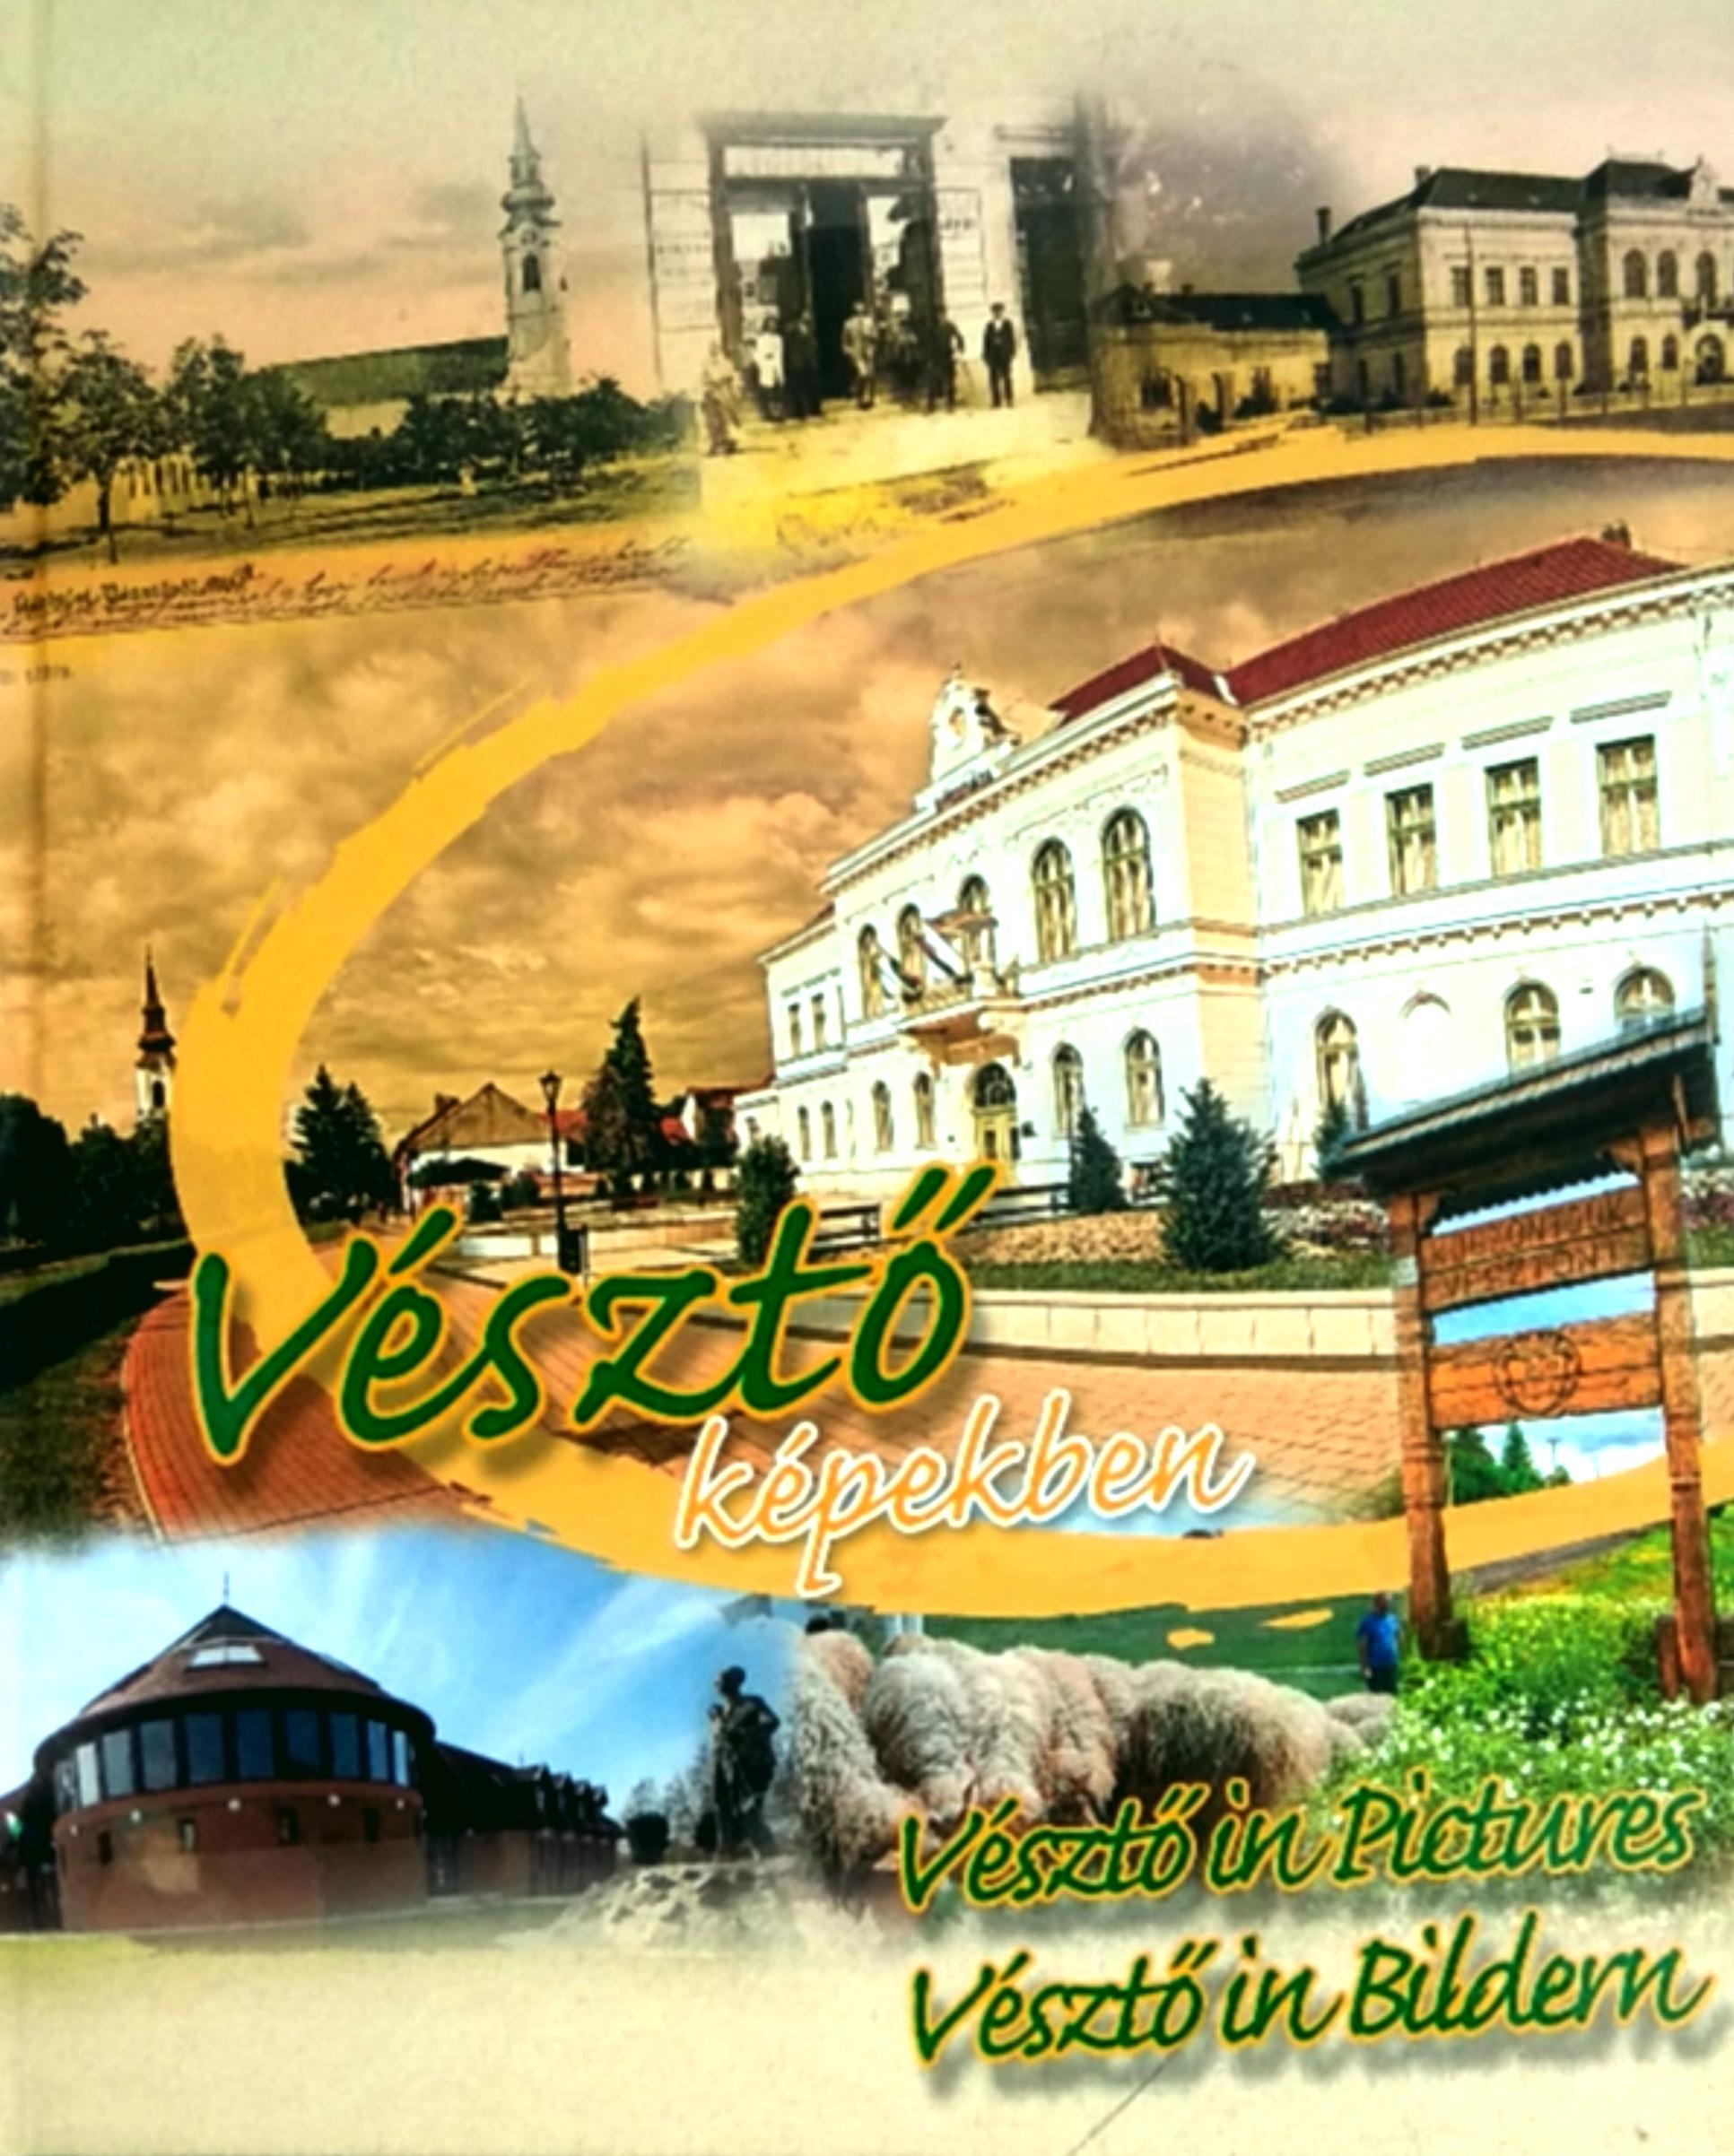 veszto_kepekben_01.jpg